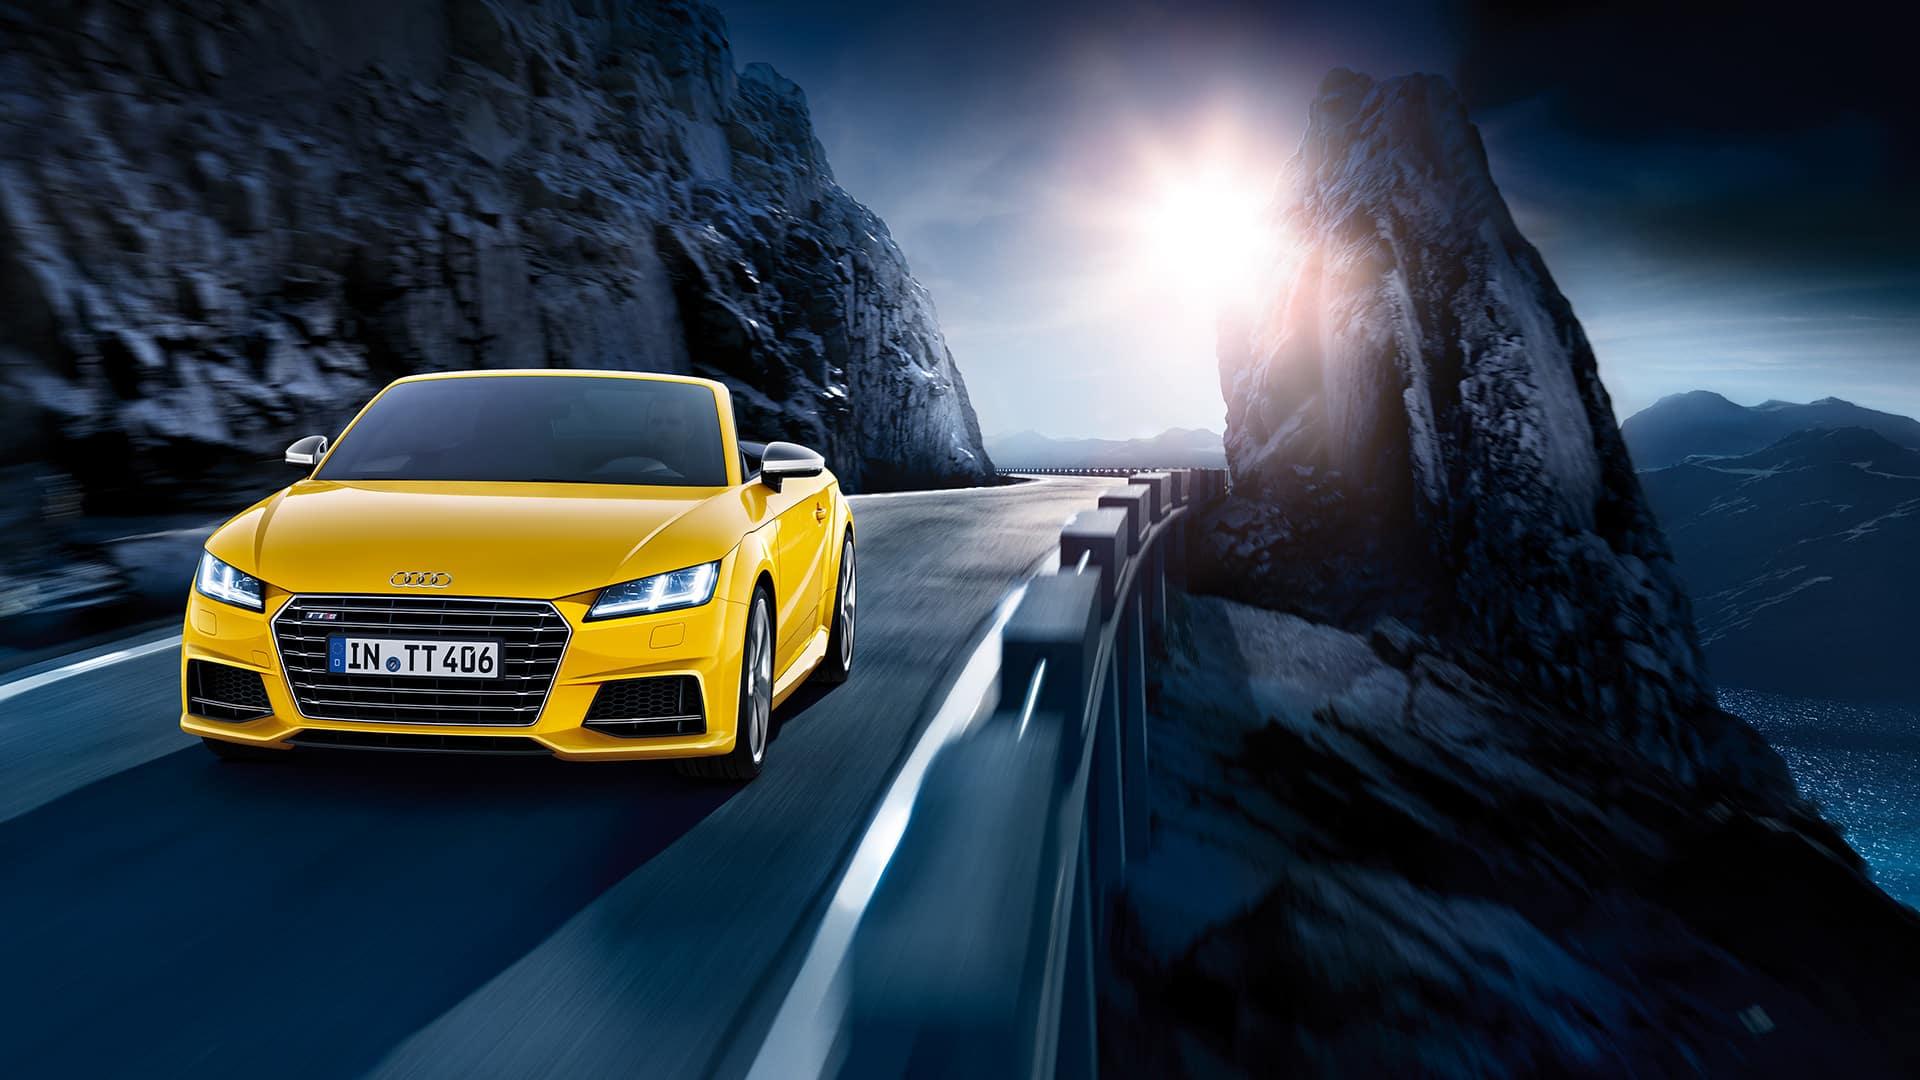 Audi TTS Roadster Authentic Sports Car Audi Australia Audi - Audi car official website